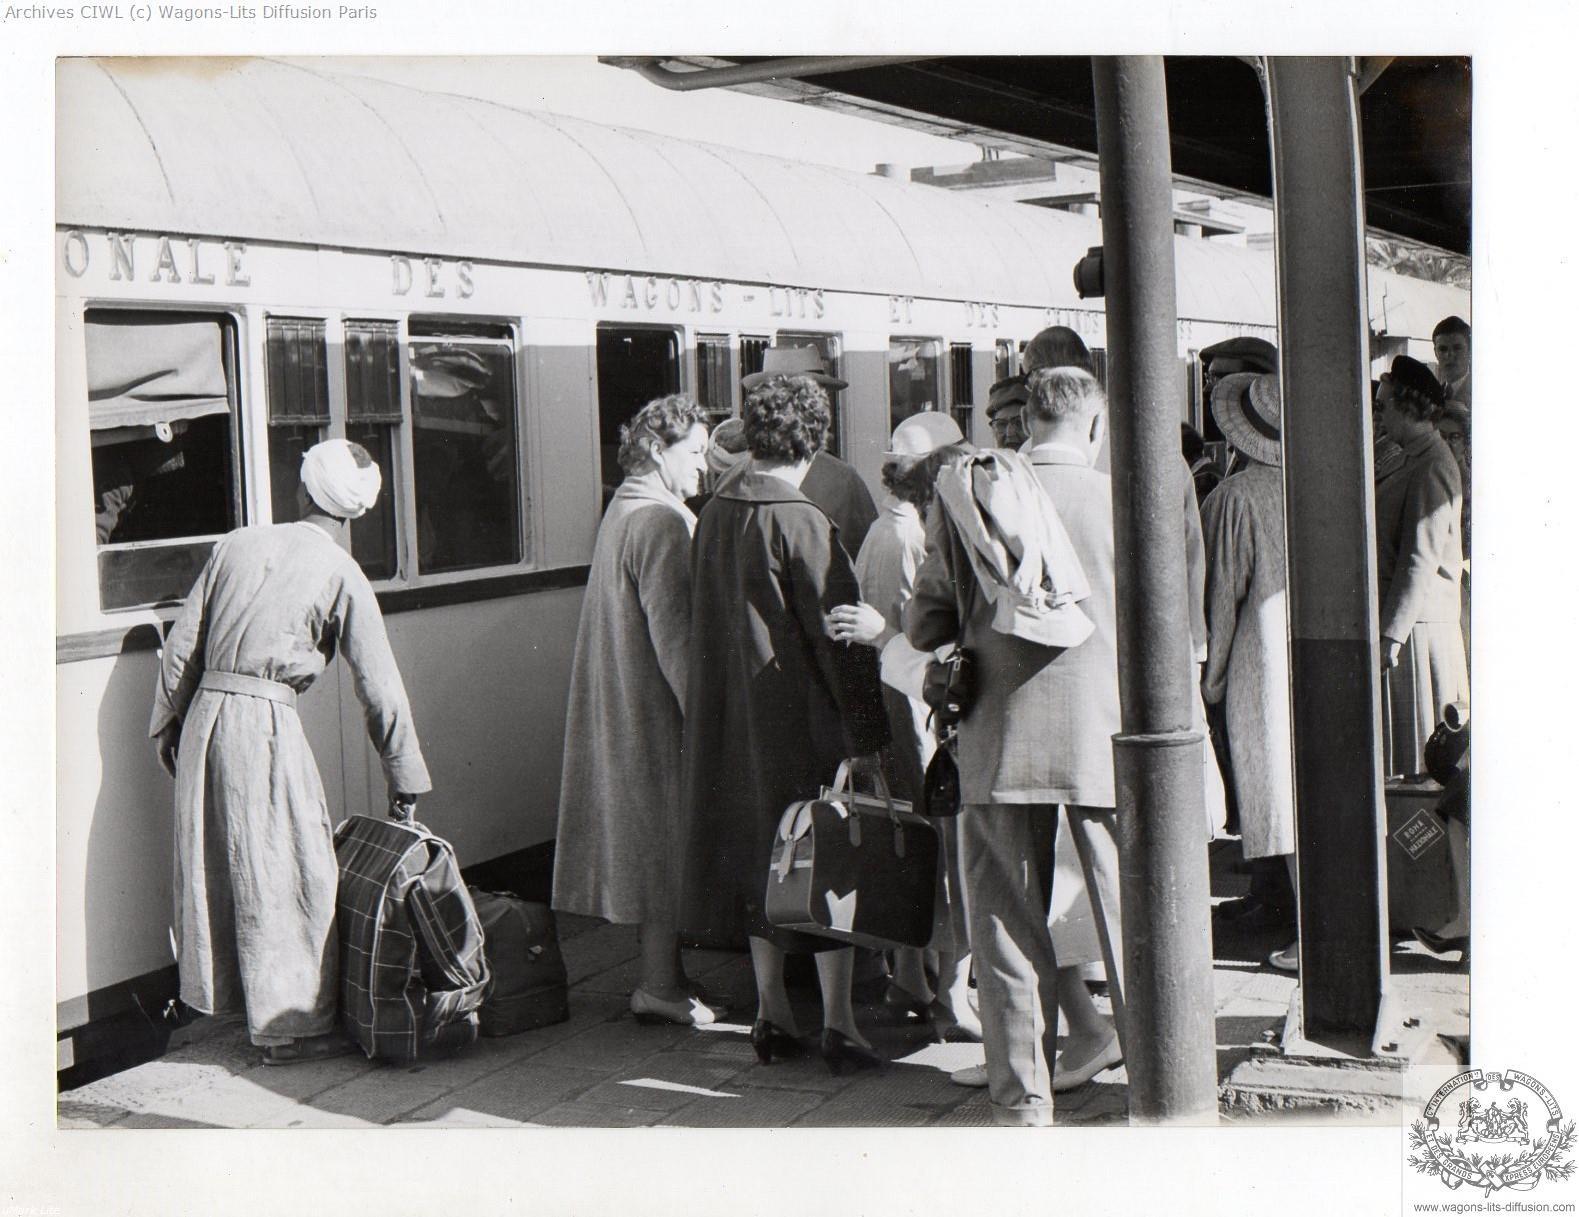 Wl egypt railways luxor train station in 1960 ciwlt coach